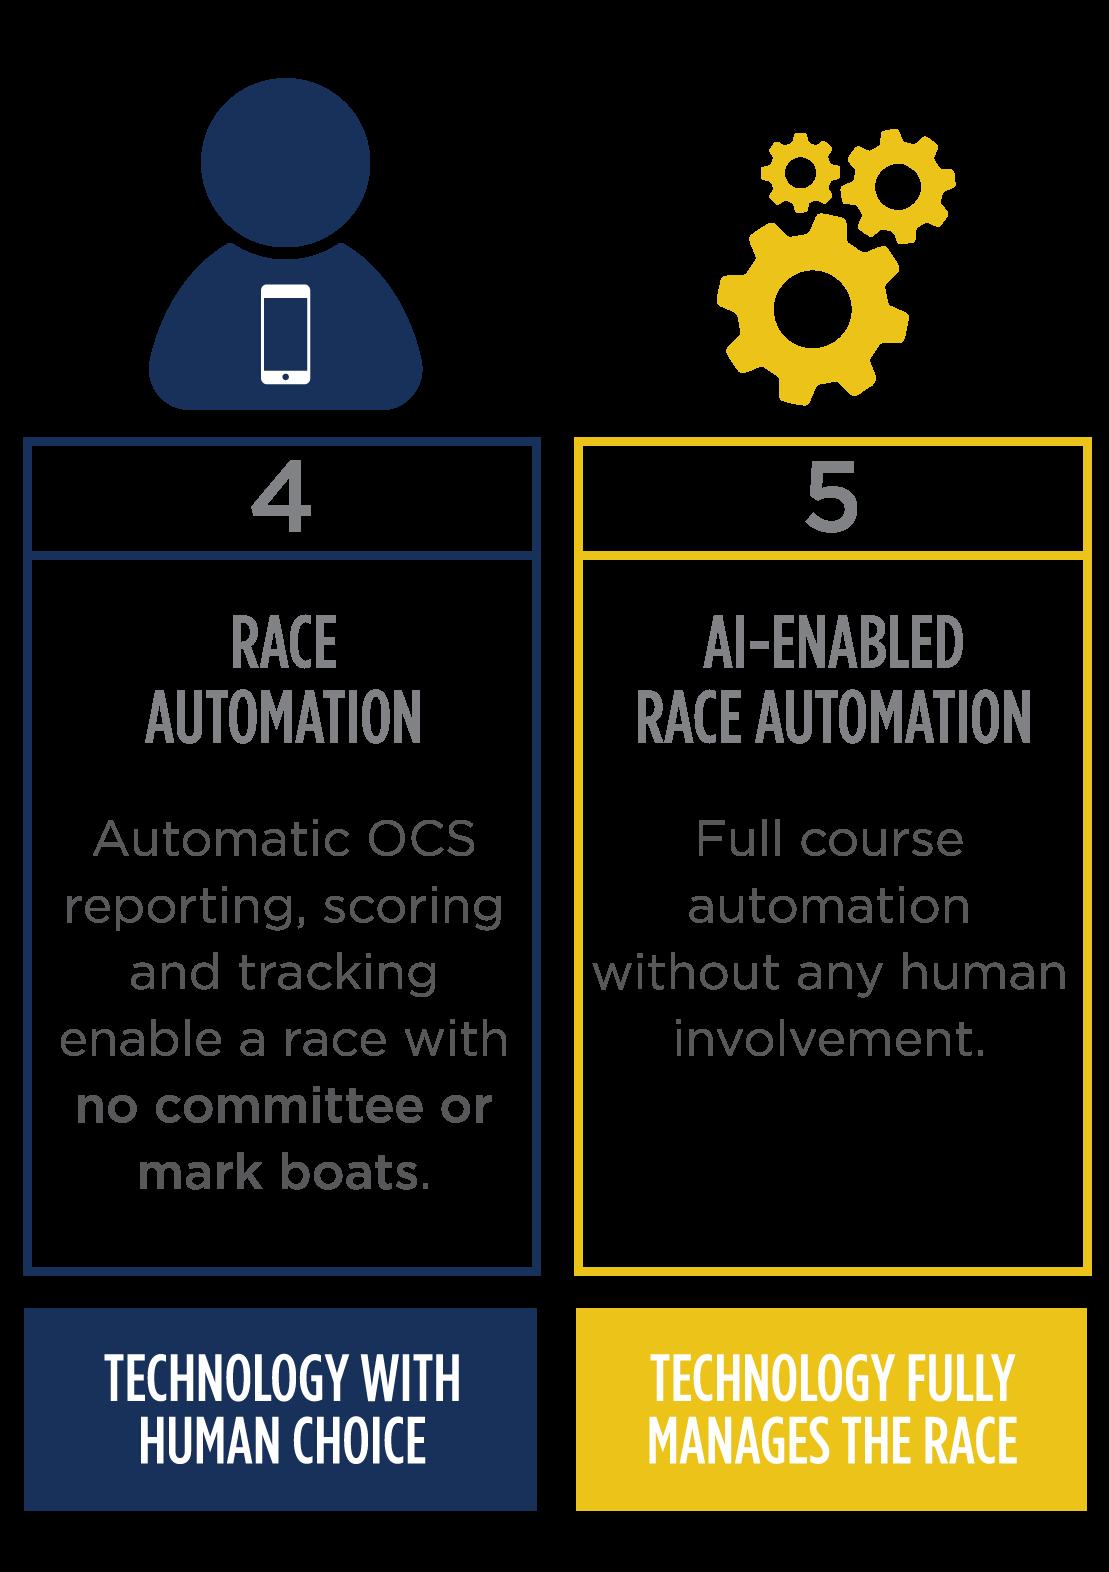 Automation Levels 4-5